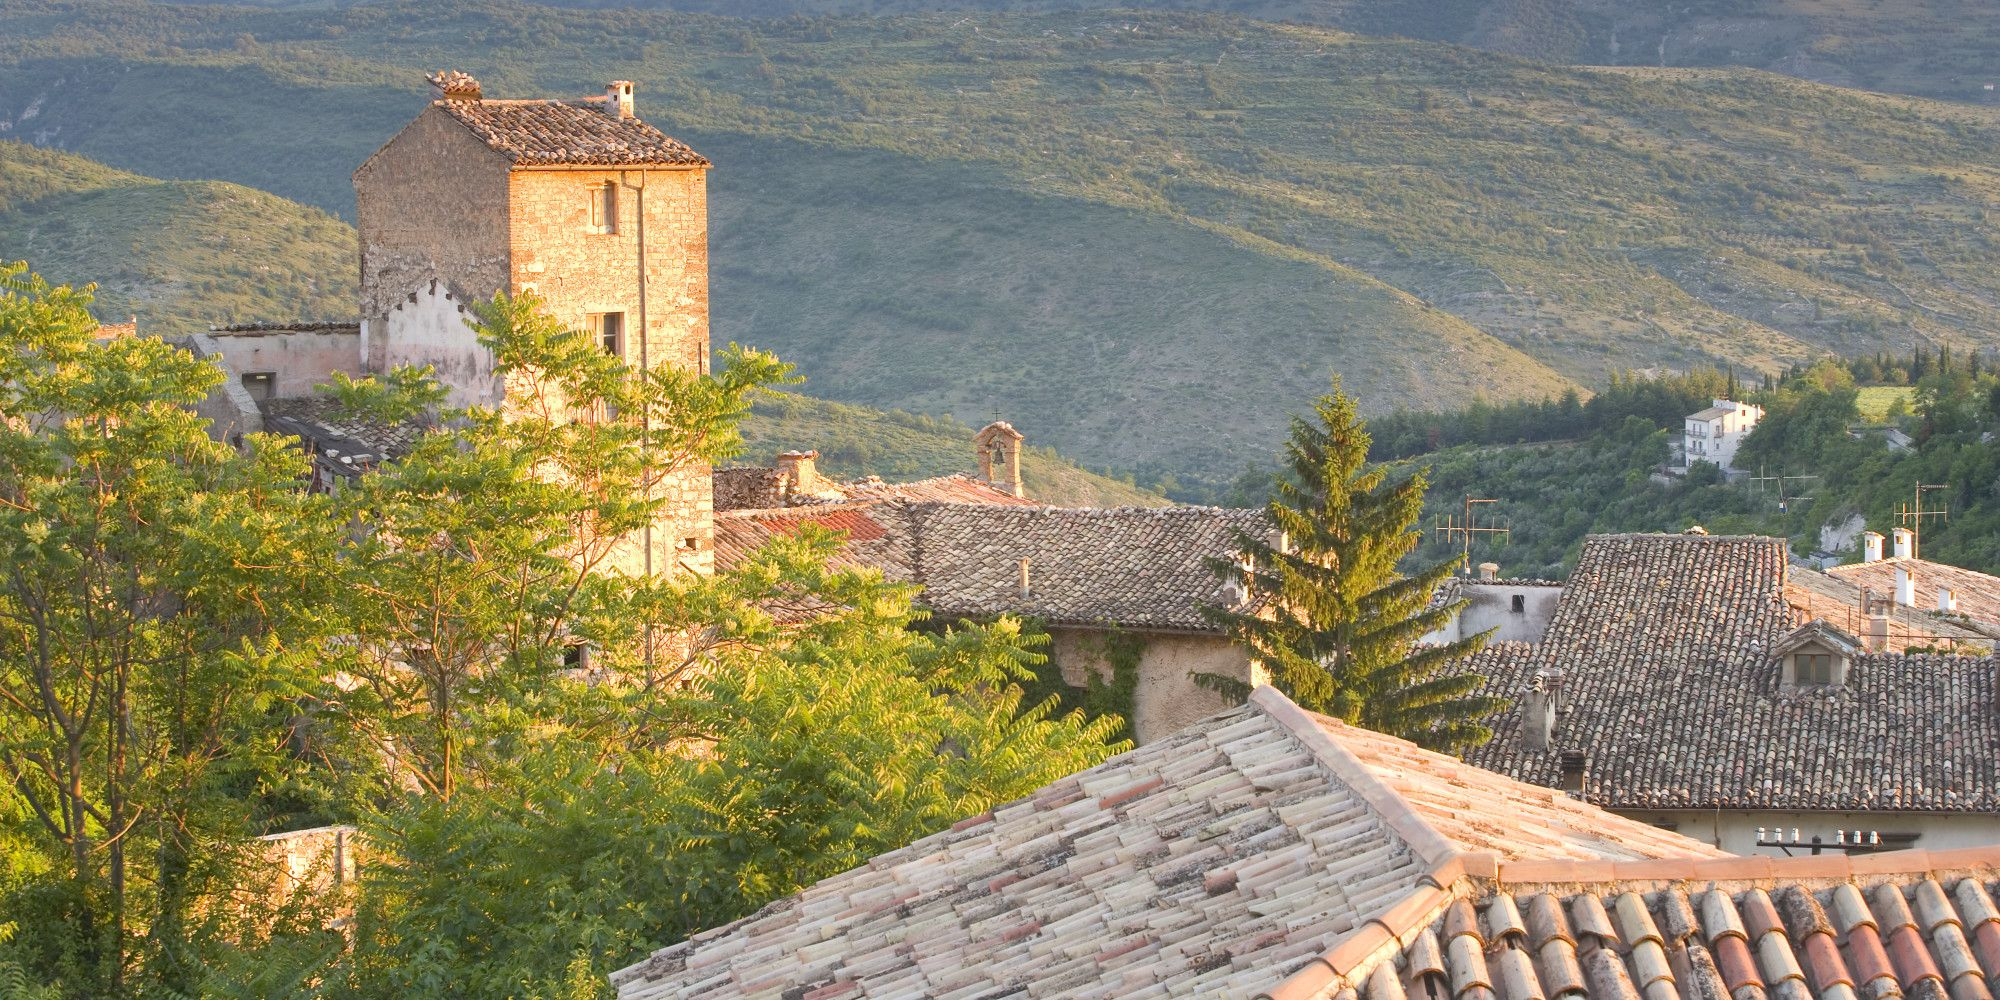 Worlds Most Romantic Places To Retire Romantic Places - Top 10 most romantic places on earth